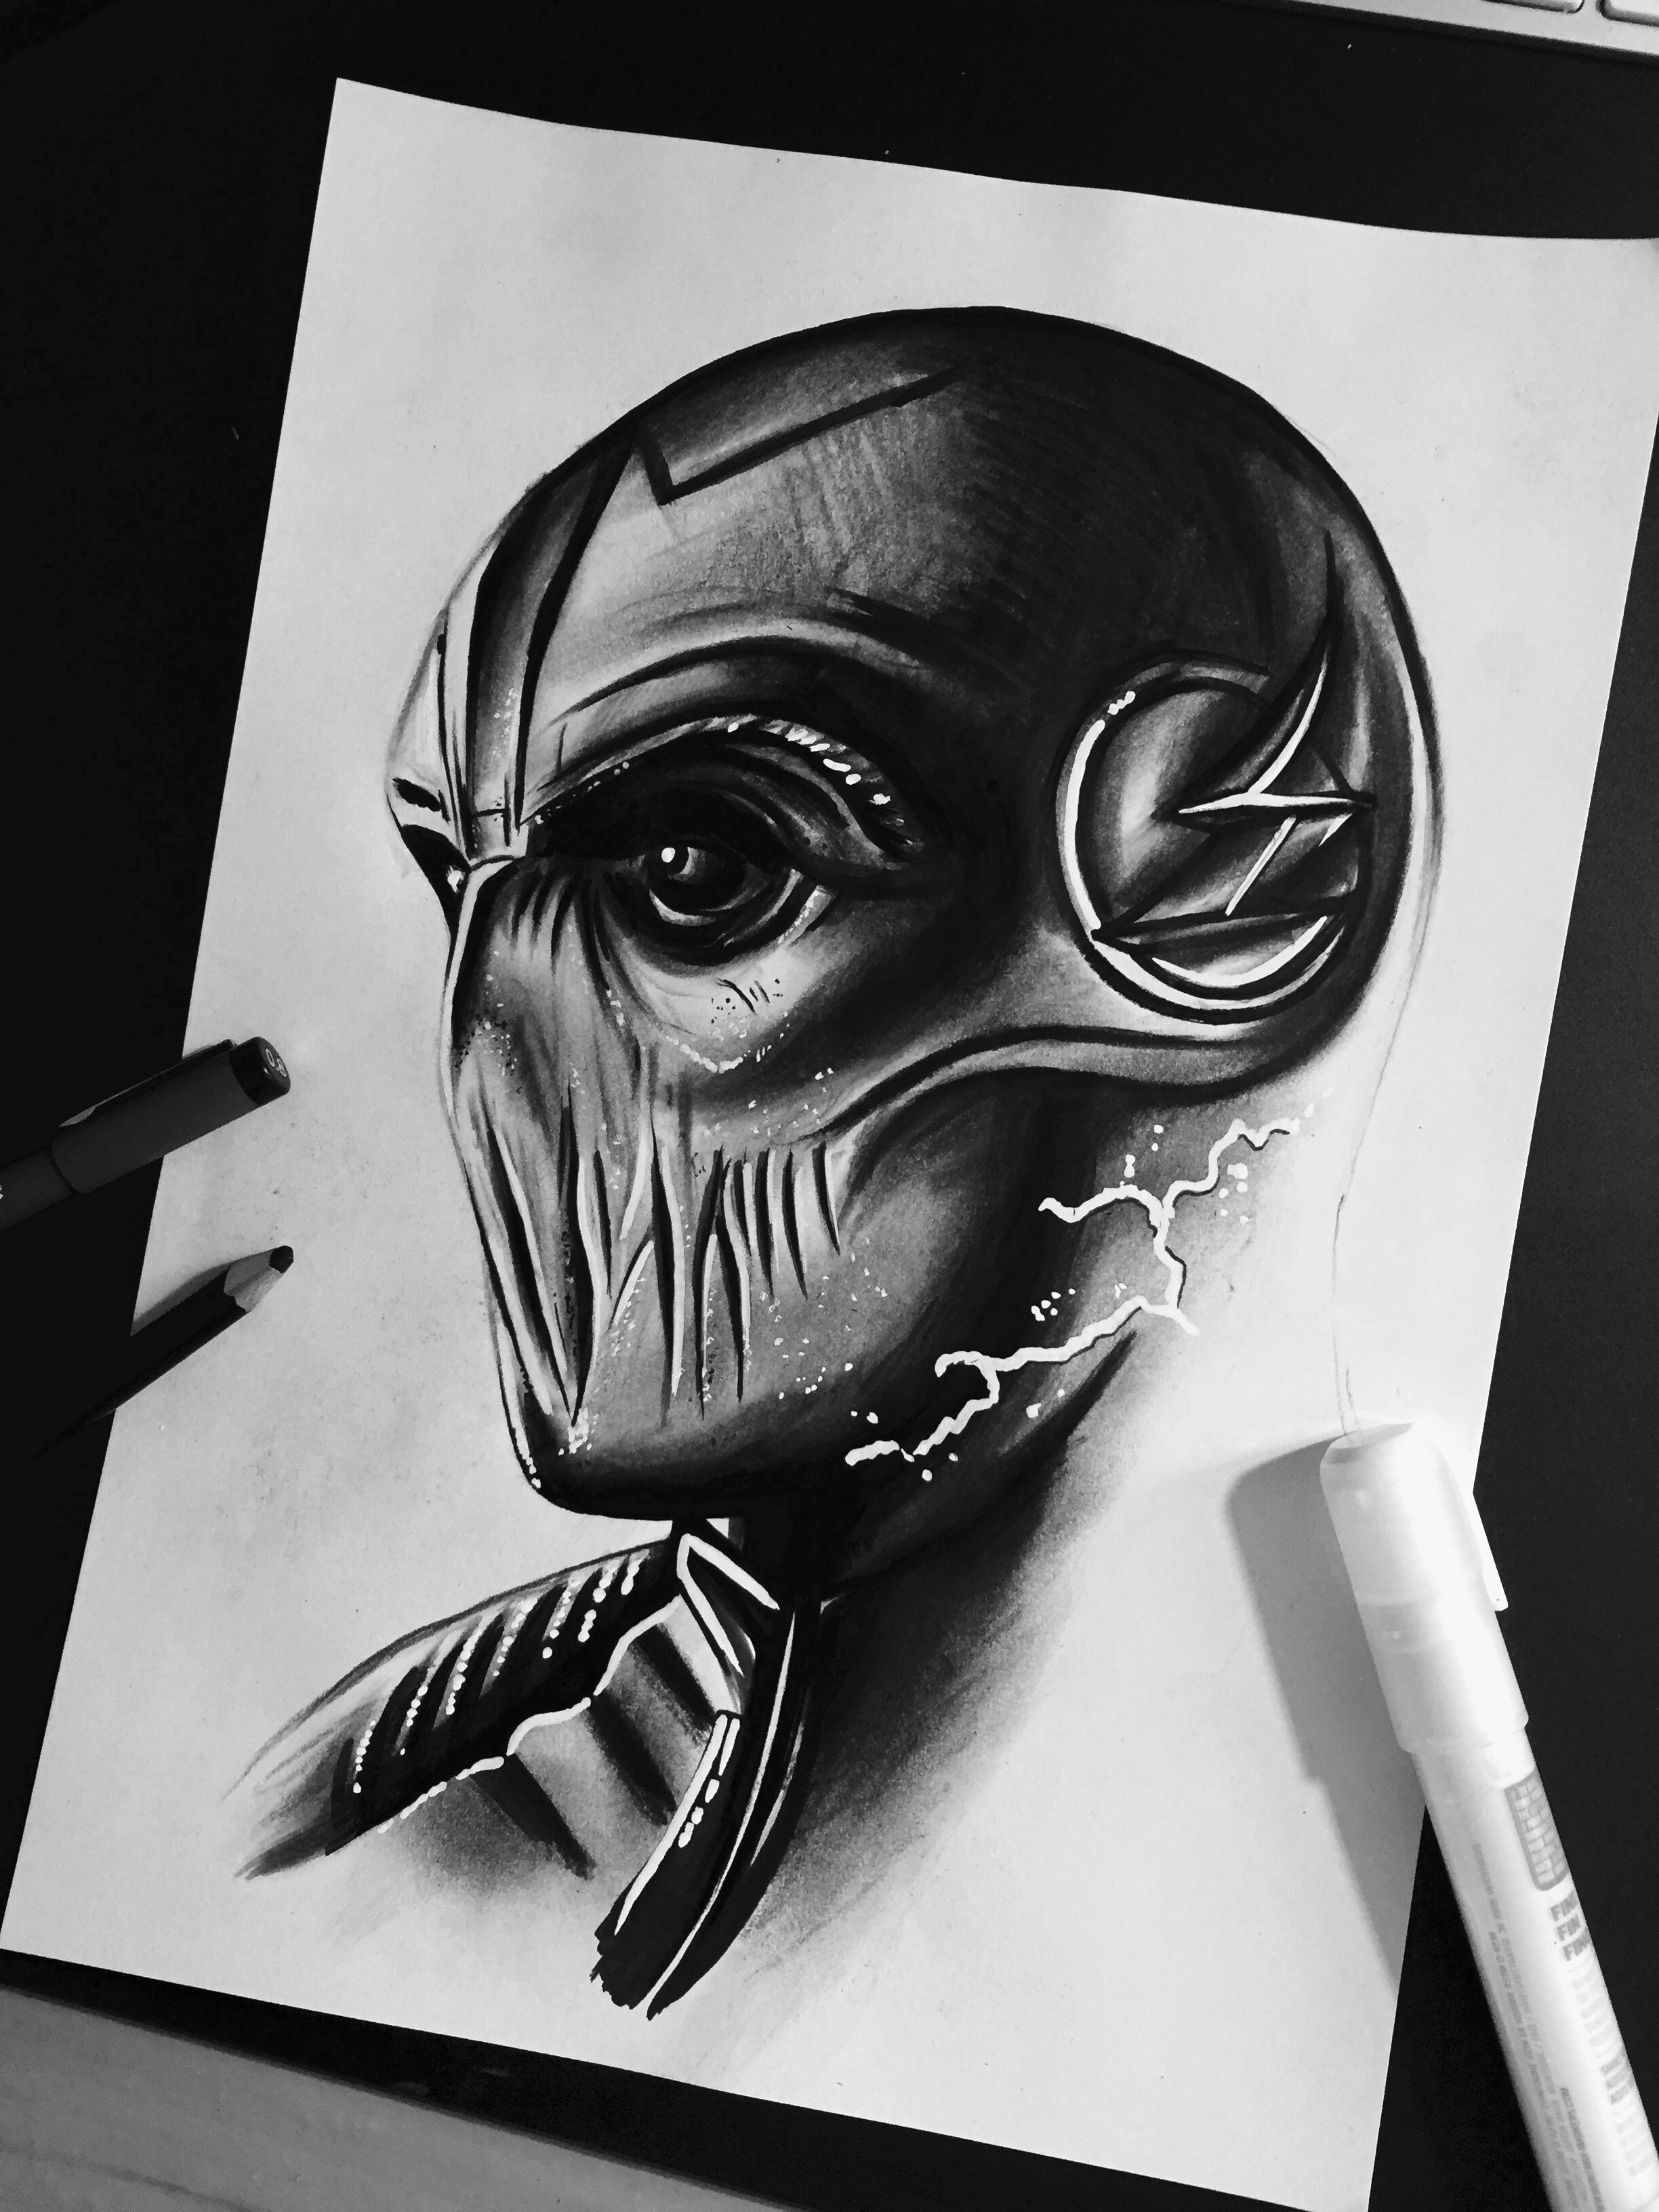 The Zoom Villain Drawing Desenhos Preto E Branco Desenho De